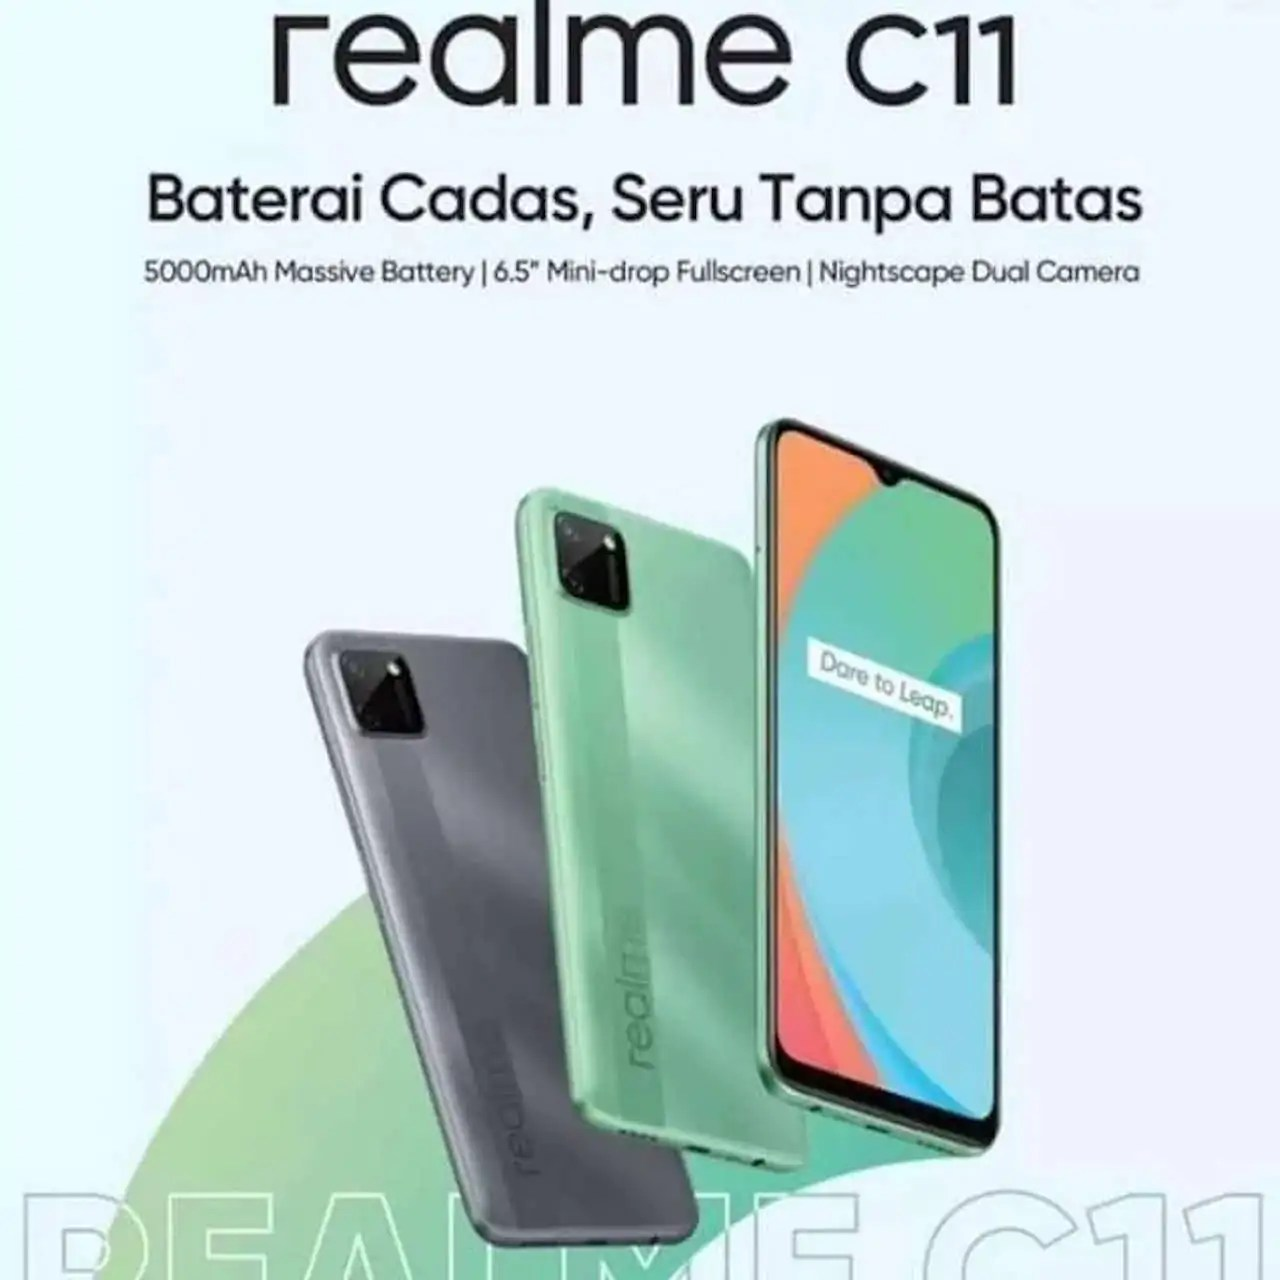 Realme C11 станет первым смартфоном с MediaTek Helio G35 - GizChina.it